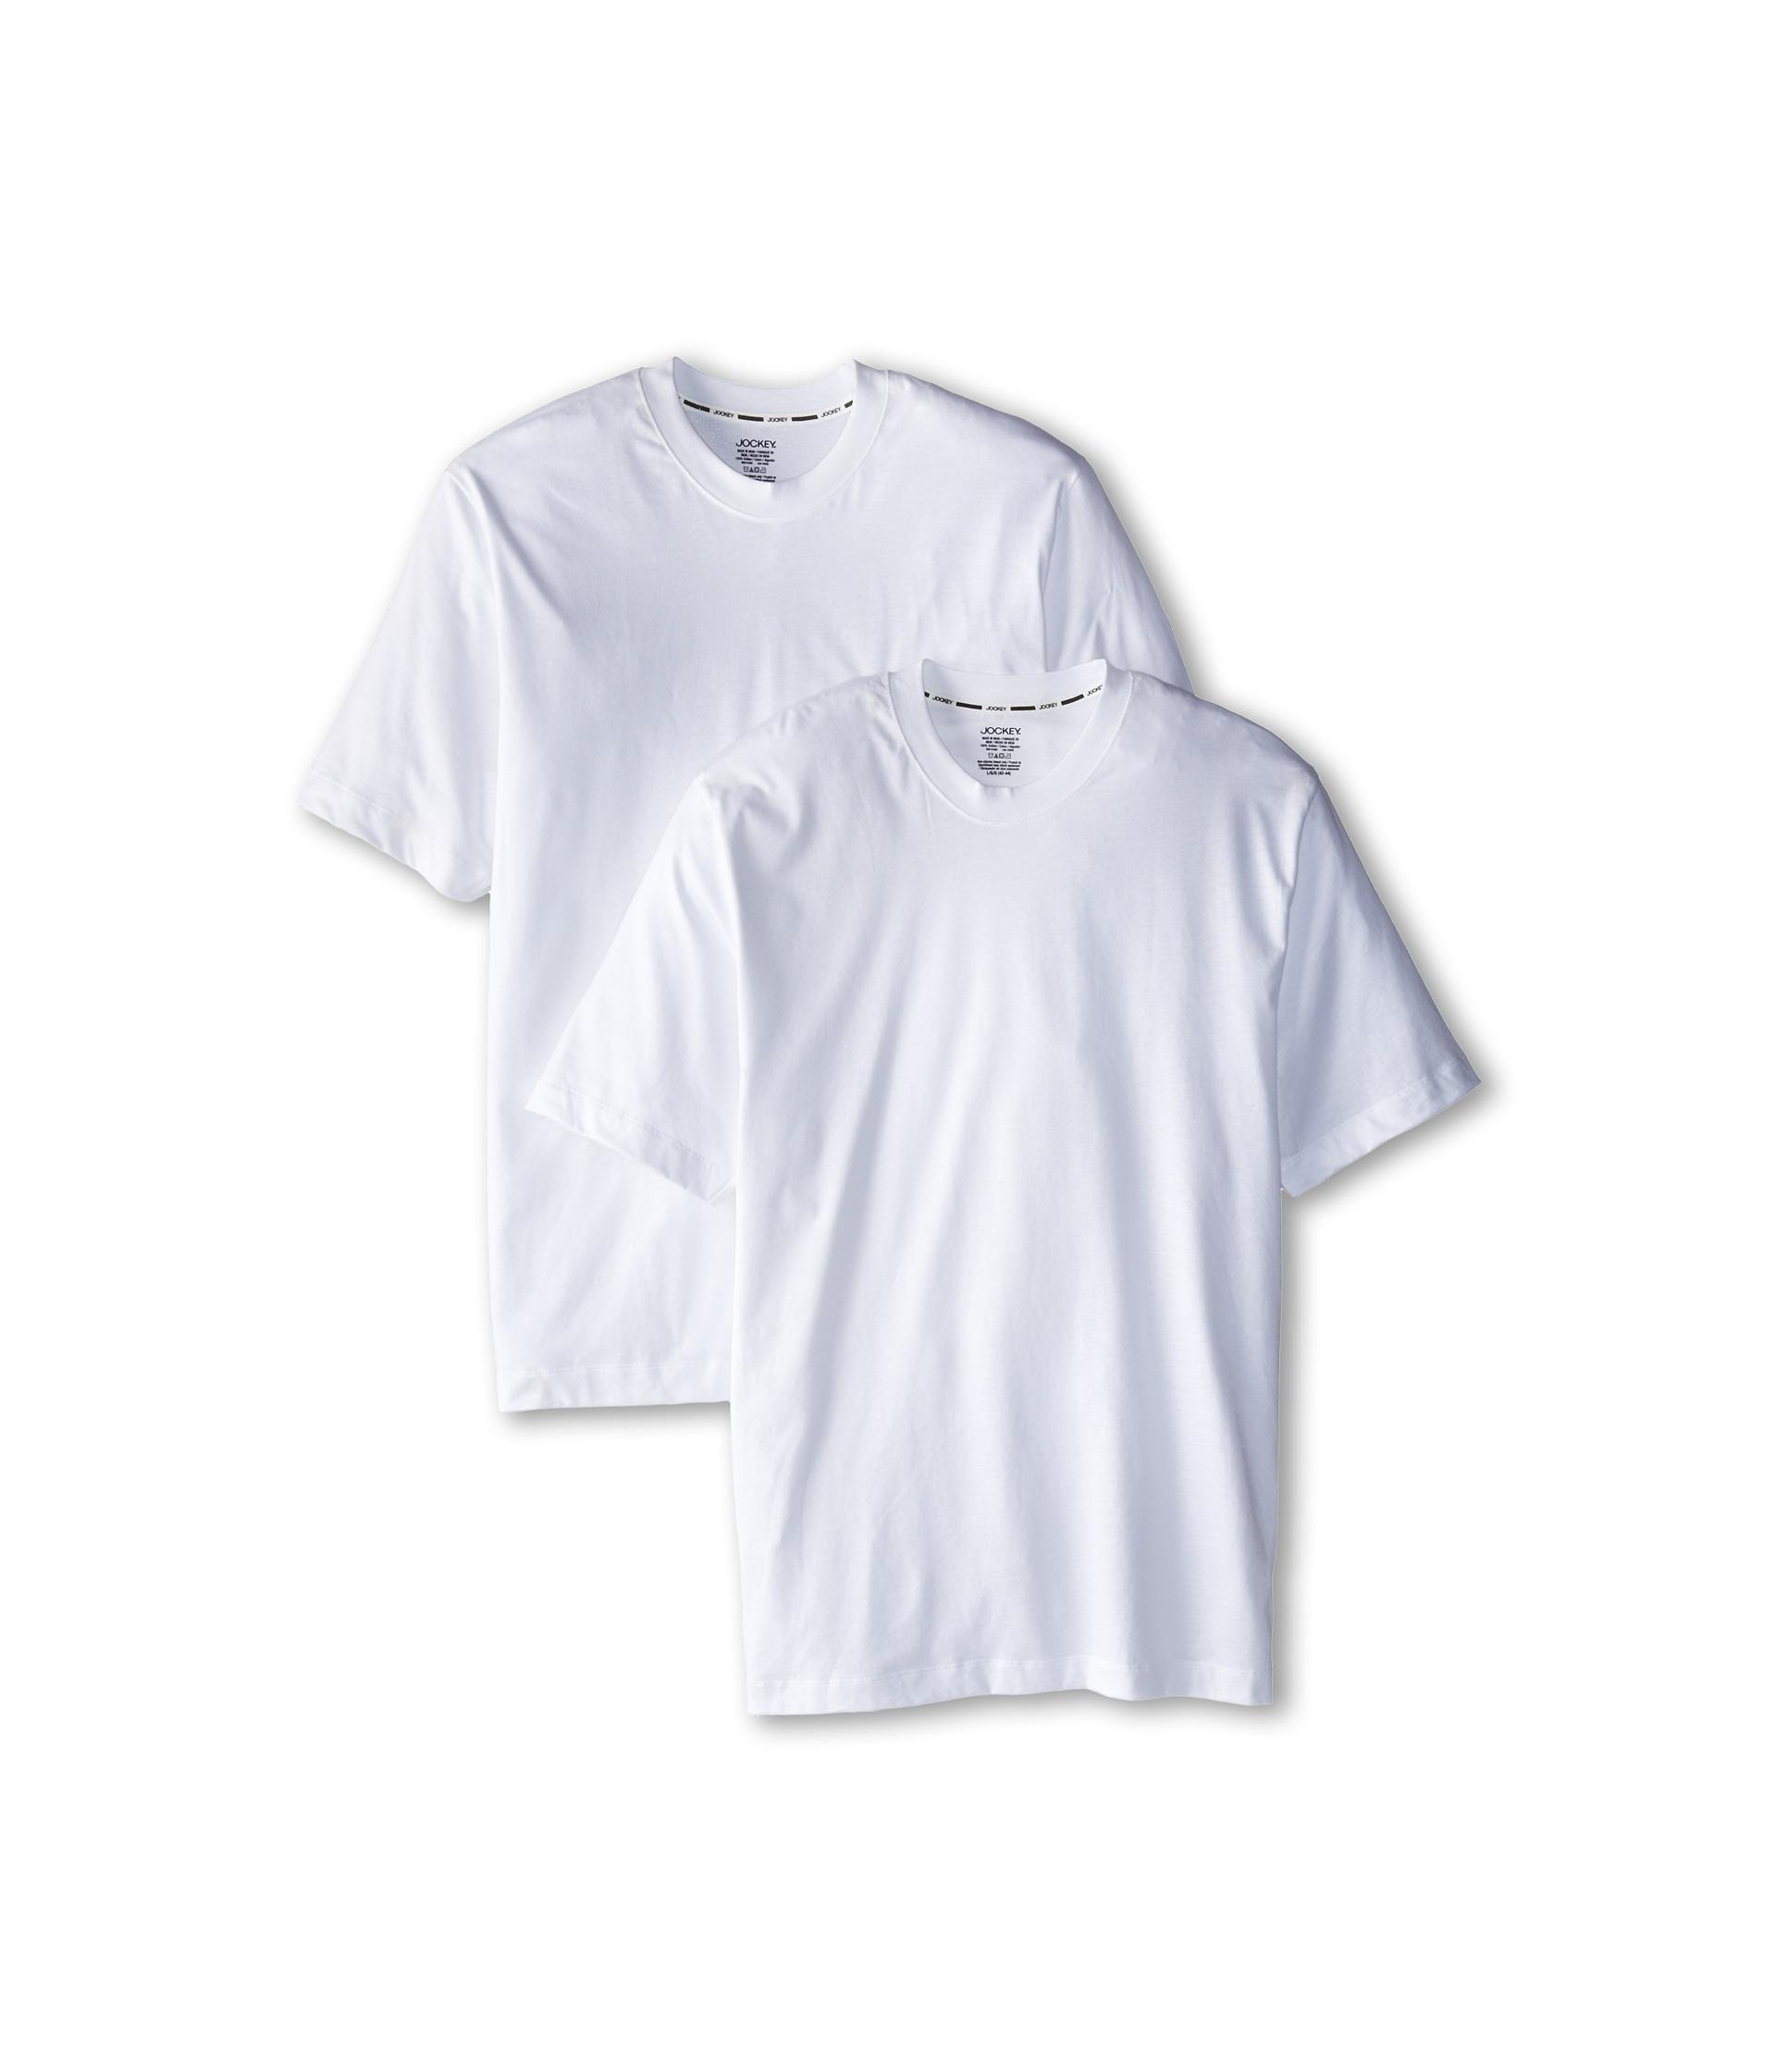 Jockey staycool crew neck t shirt 2 pack at for Jockey t shirts sale